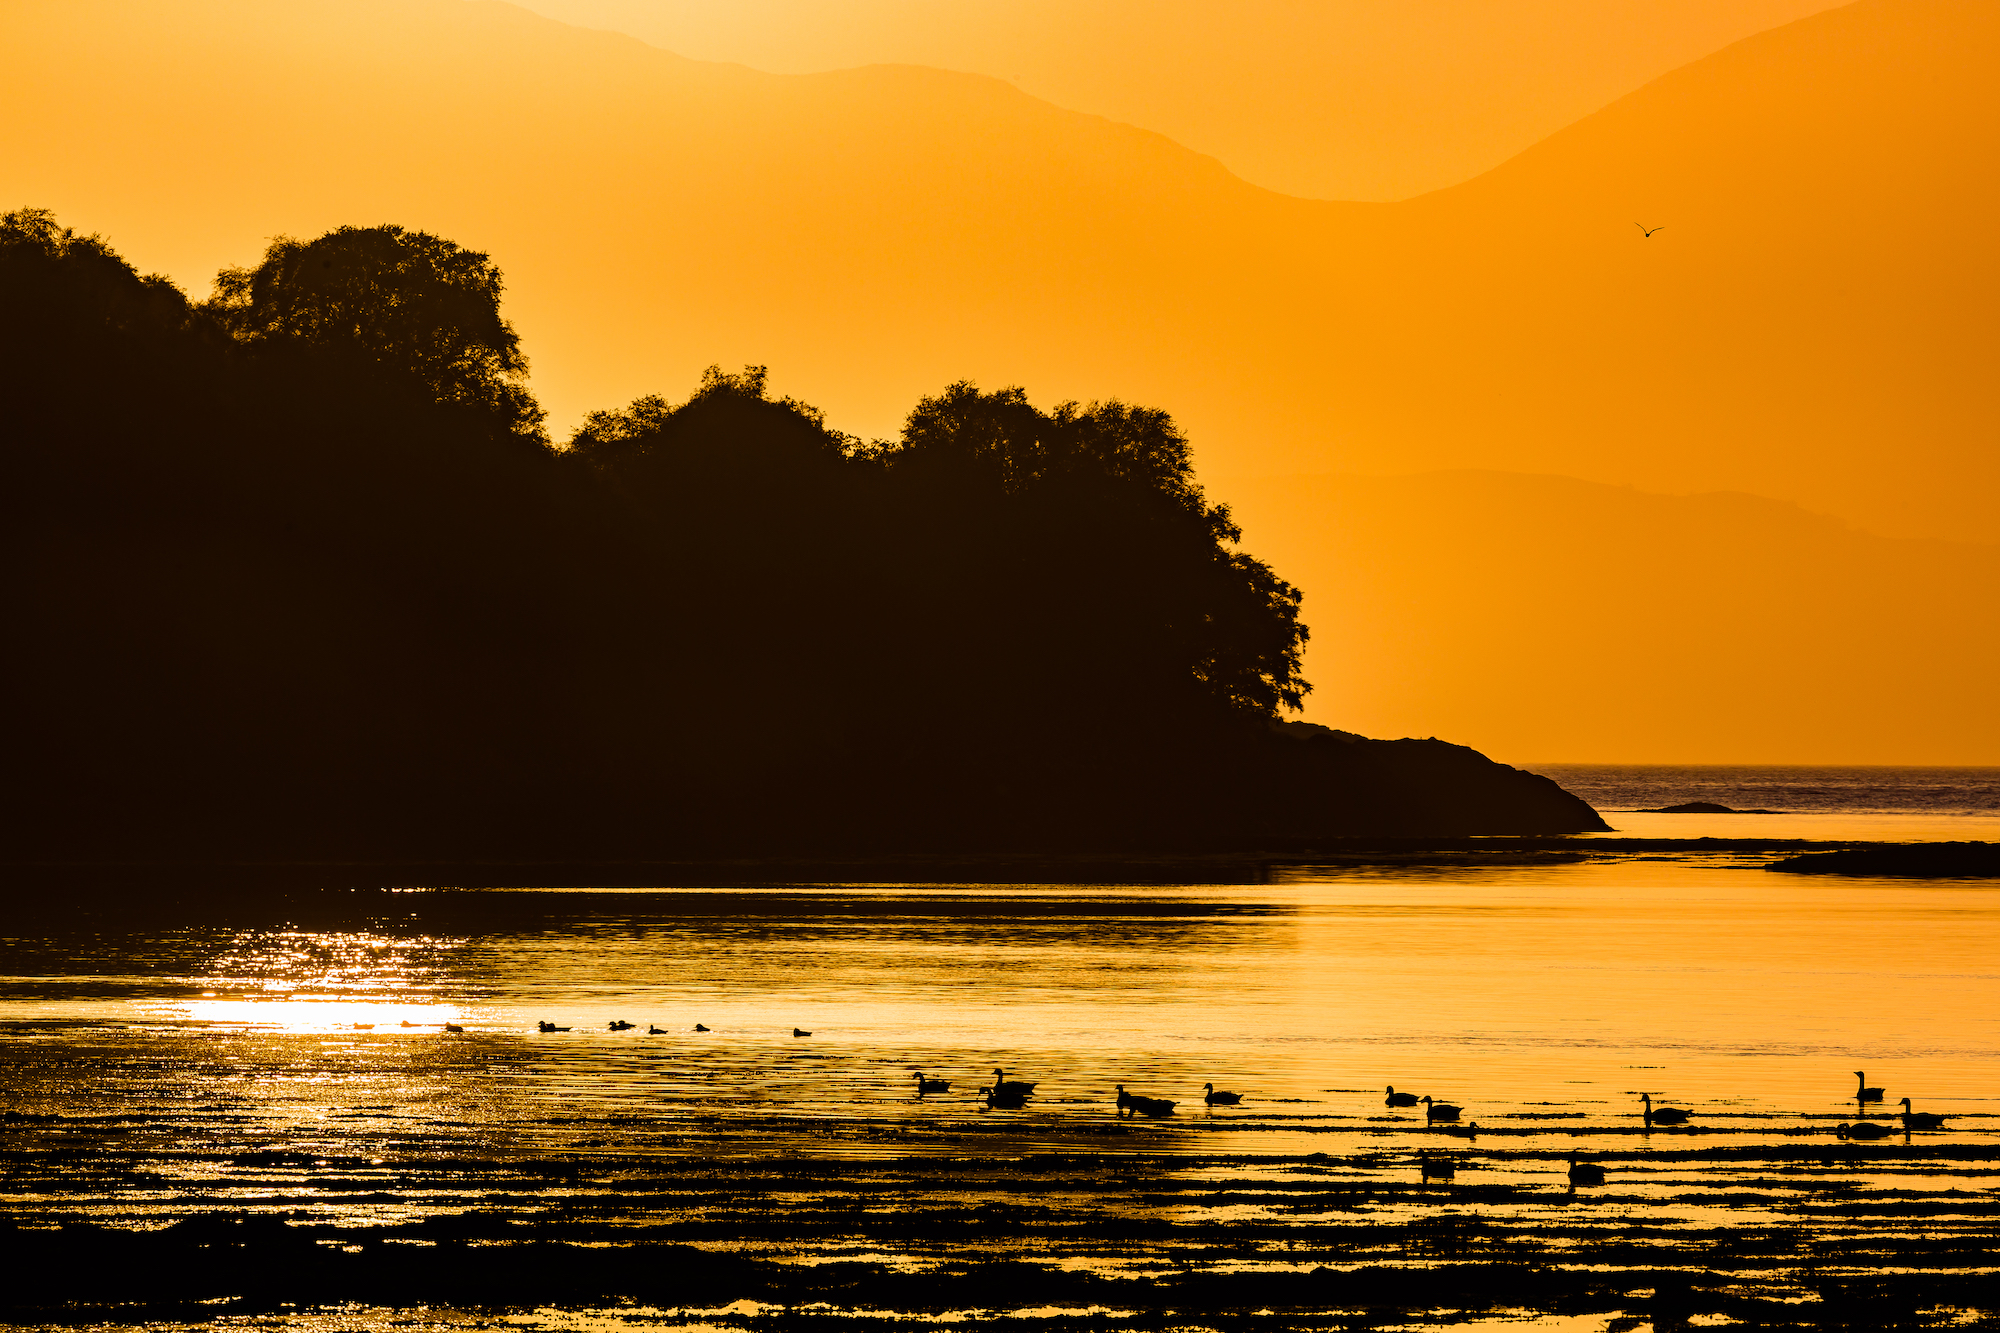 (674) Canada Geese at Sunset, Loch Feochan, Oban, Argyll and Bute, Scotland. Copyright David Wheater.jpg